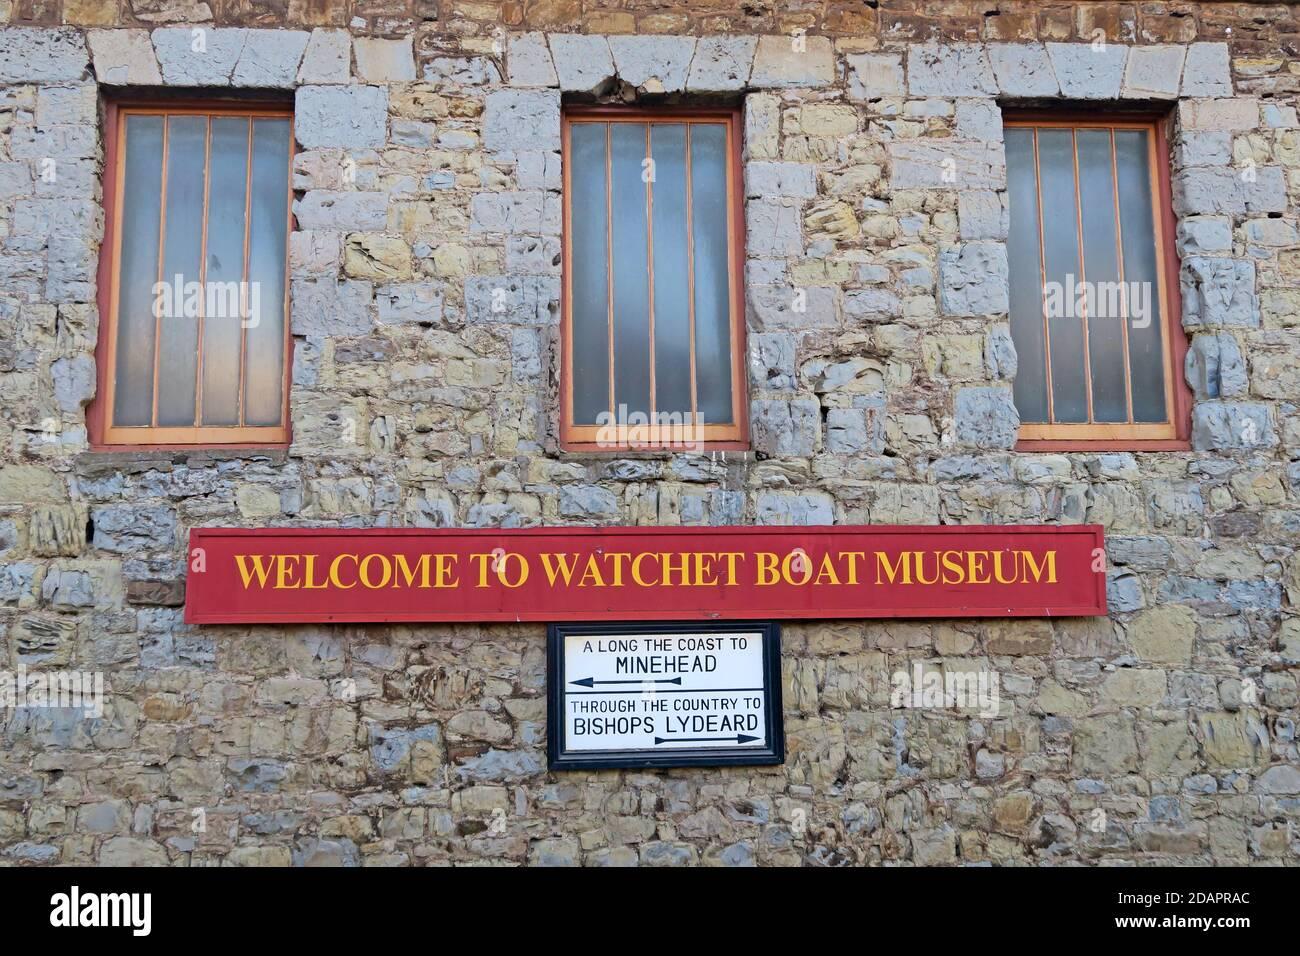 Dieses Stockfoto: Watchet Boat Museum, Watchet Visitor Center, Harbour Rd, Watchet TA23 0AQ - 2DAPRA